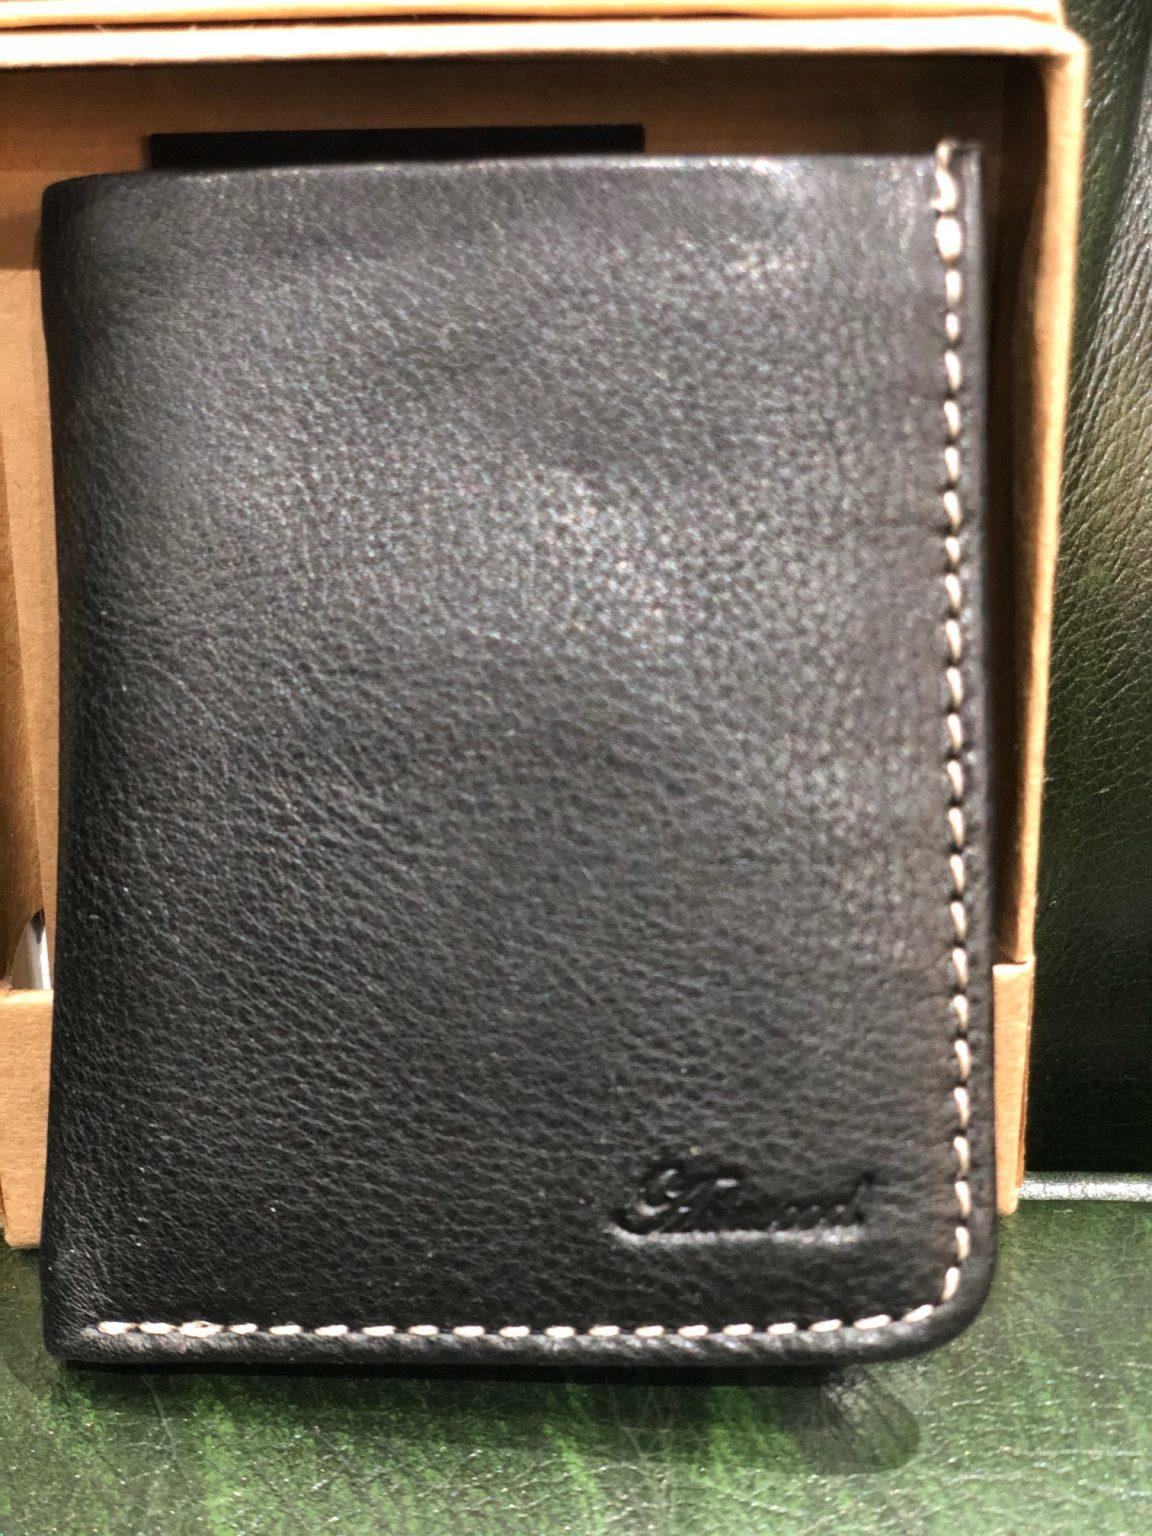 Ashwood Leather Wallet in Black or Tan